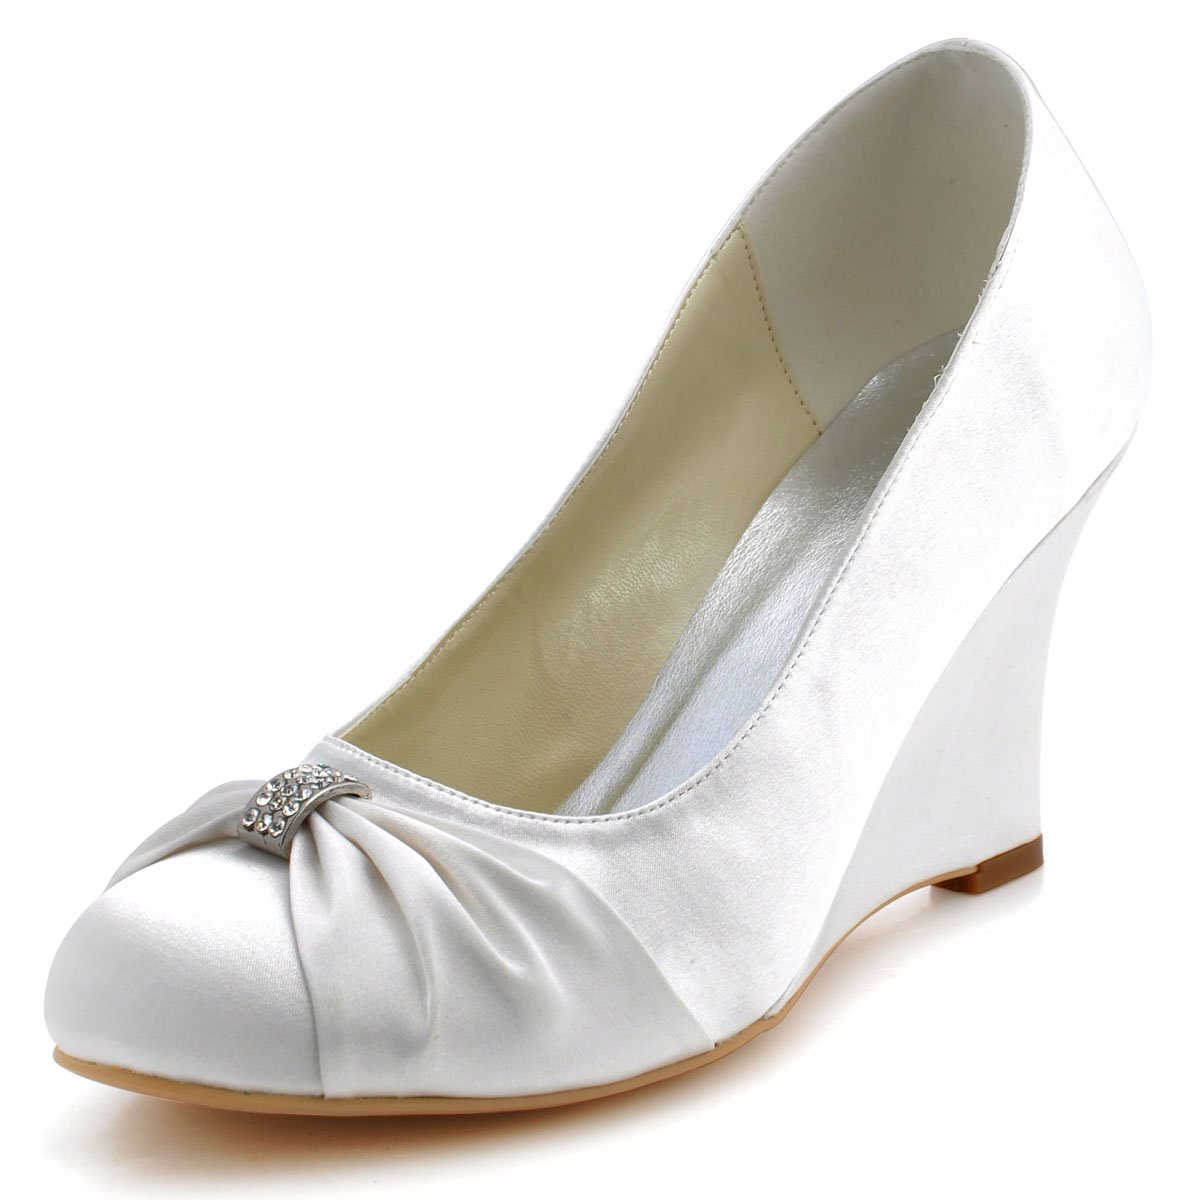 ElegantPark EP2005 Women High Heel Pumps Closed Toe Rhinestones Satin Bridal Wedding Wedges Ivory US 6